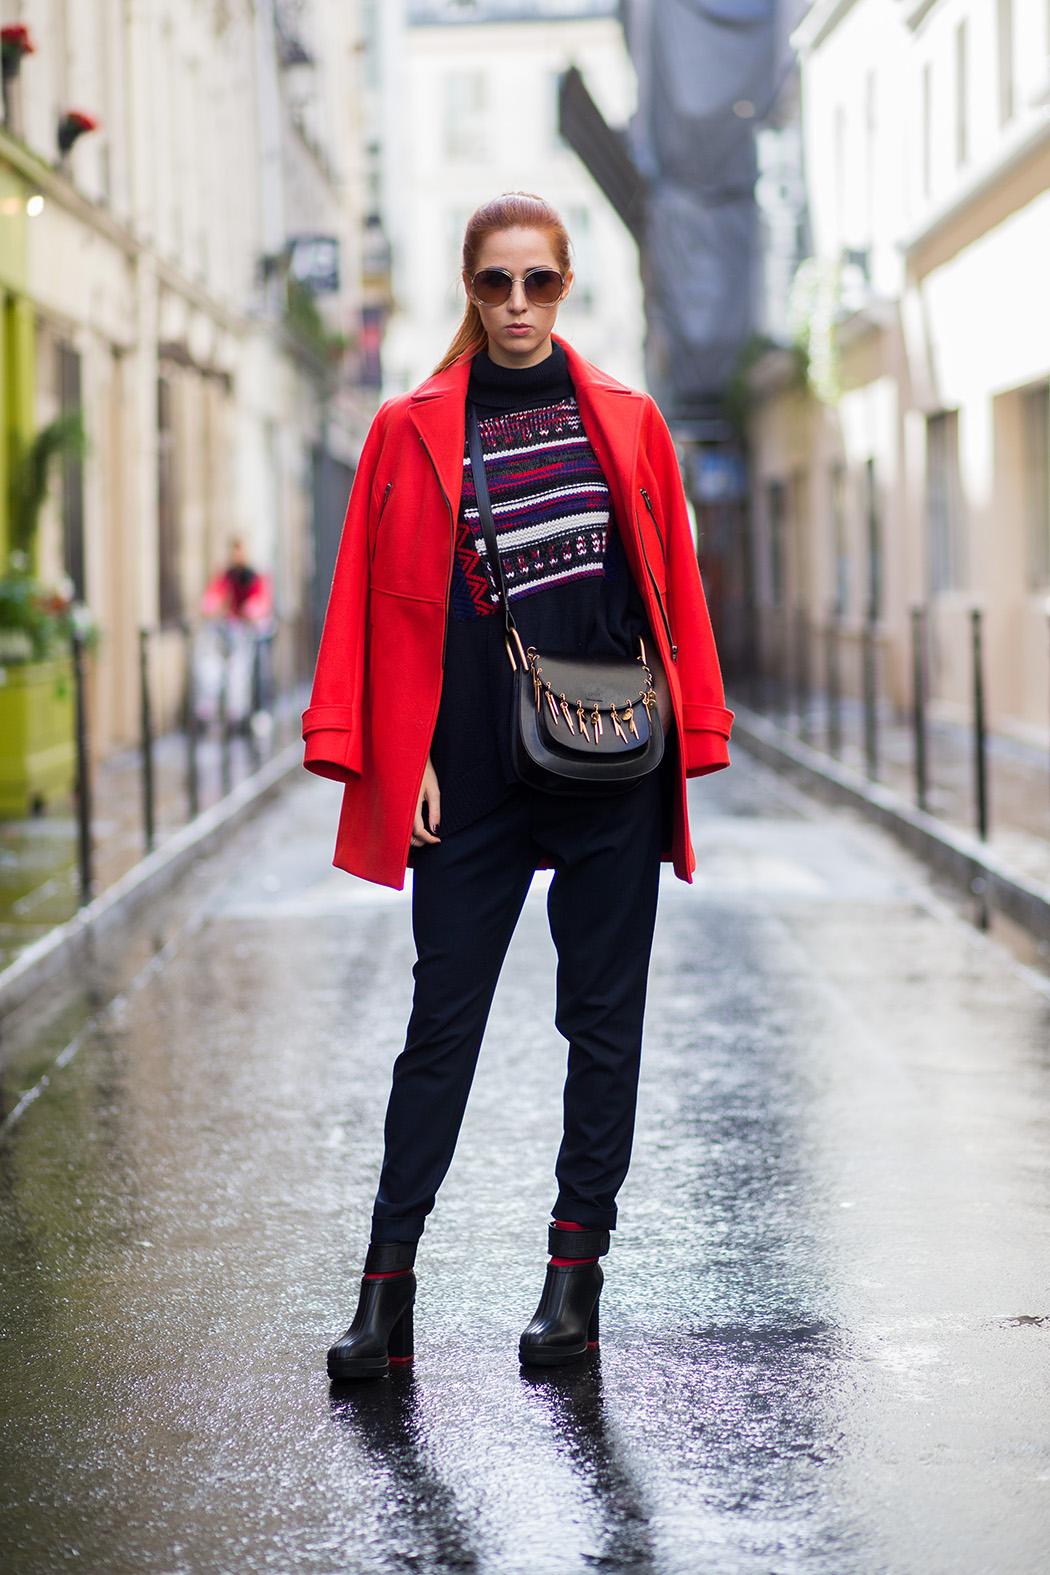 Fashionblog-Fashionblogger-Fashion-Blog-Blogger-Lifestyle-Lindarella-Linda-Sorel-PFW-Comptoir_de_cotonniers-roter_Mantel-Halfbun-München-Paris-Deutschland-159